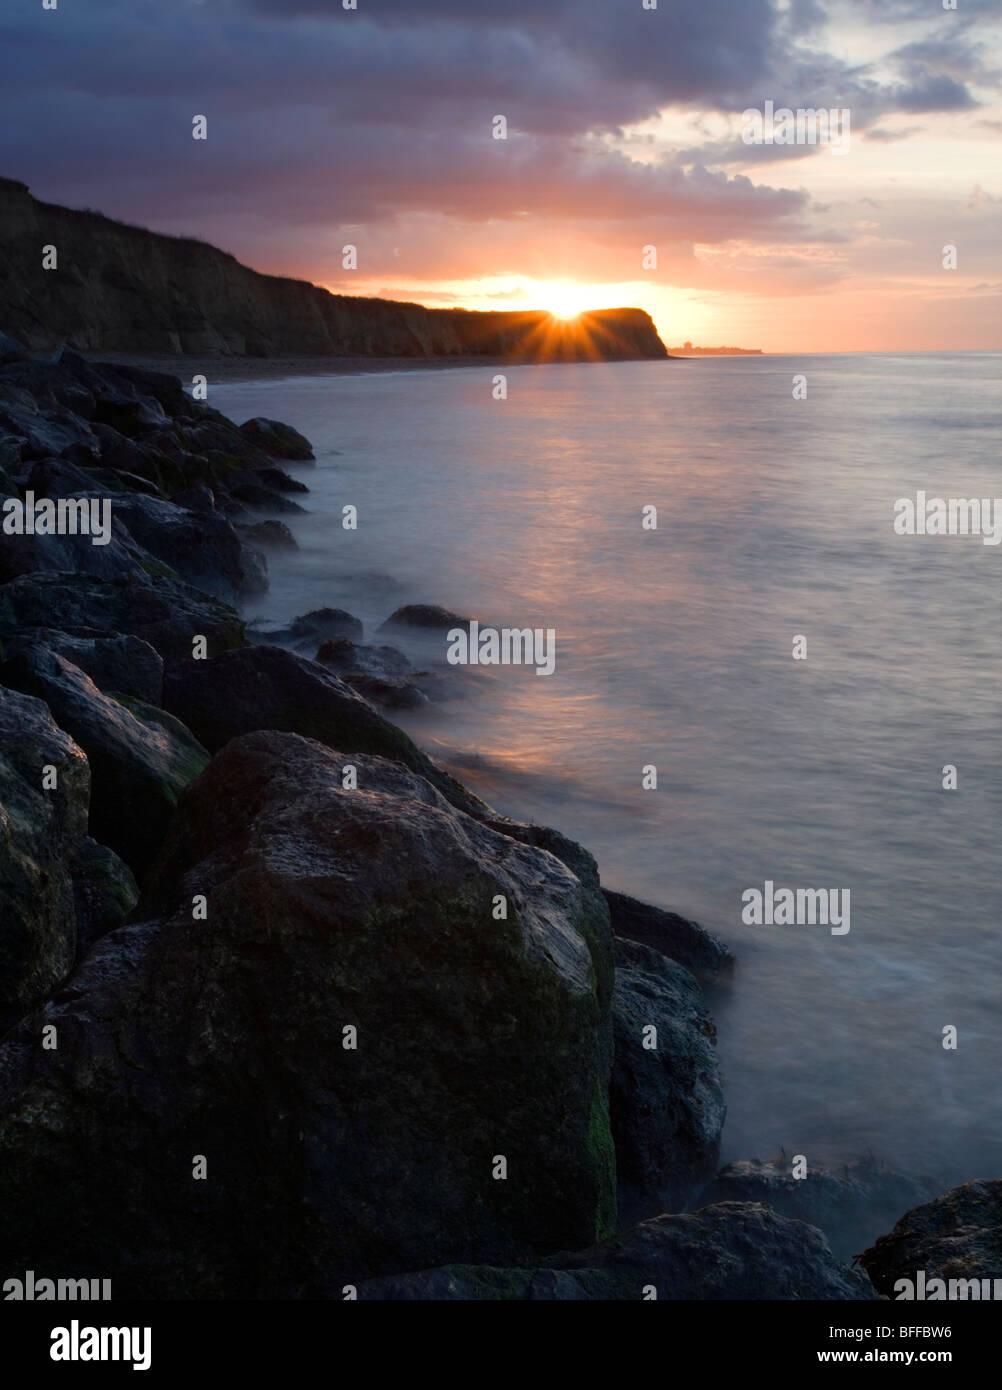 Sunset at Reculver beach in Kent, UK. Stock Photo